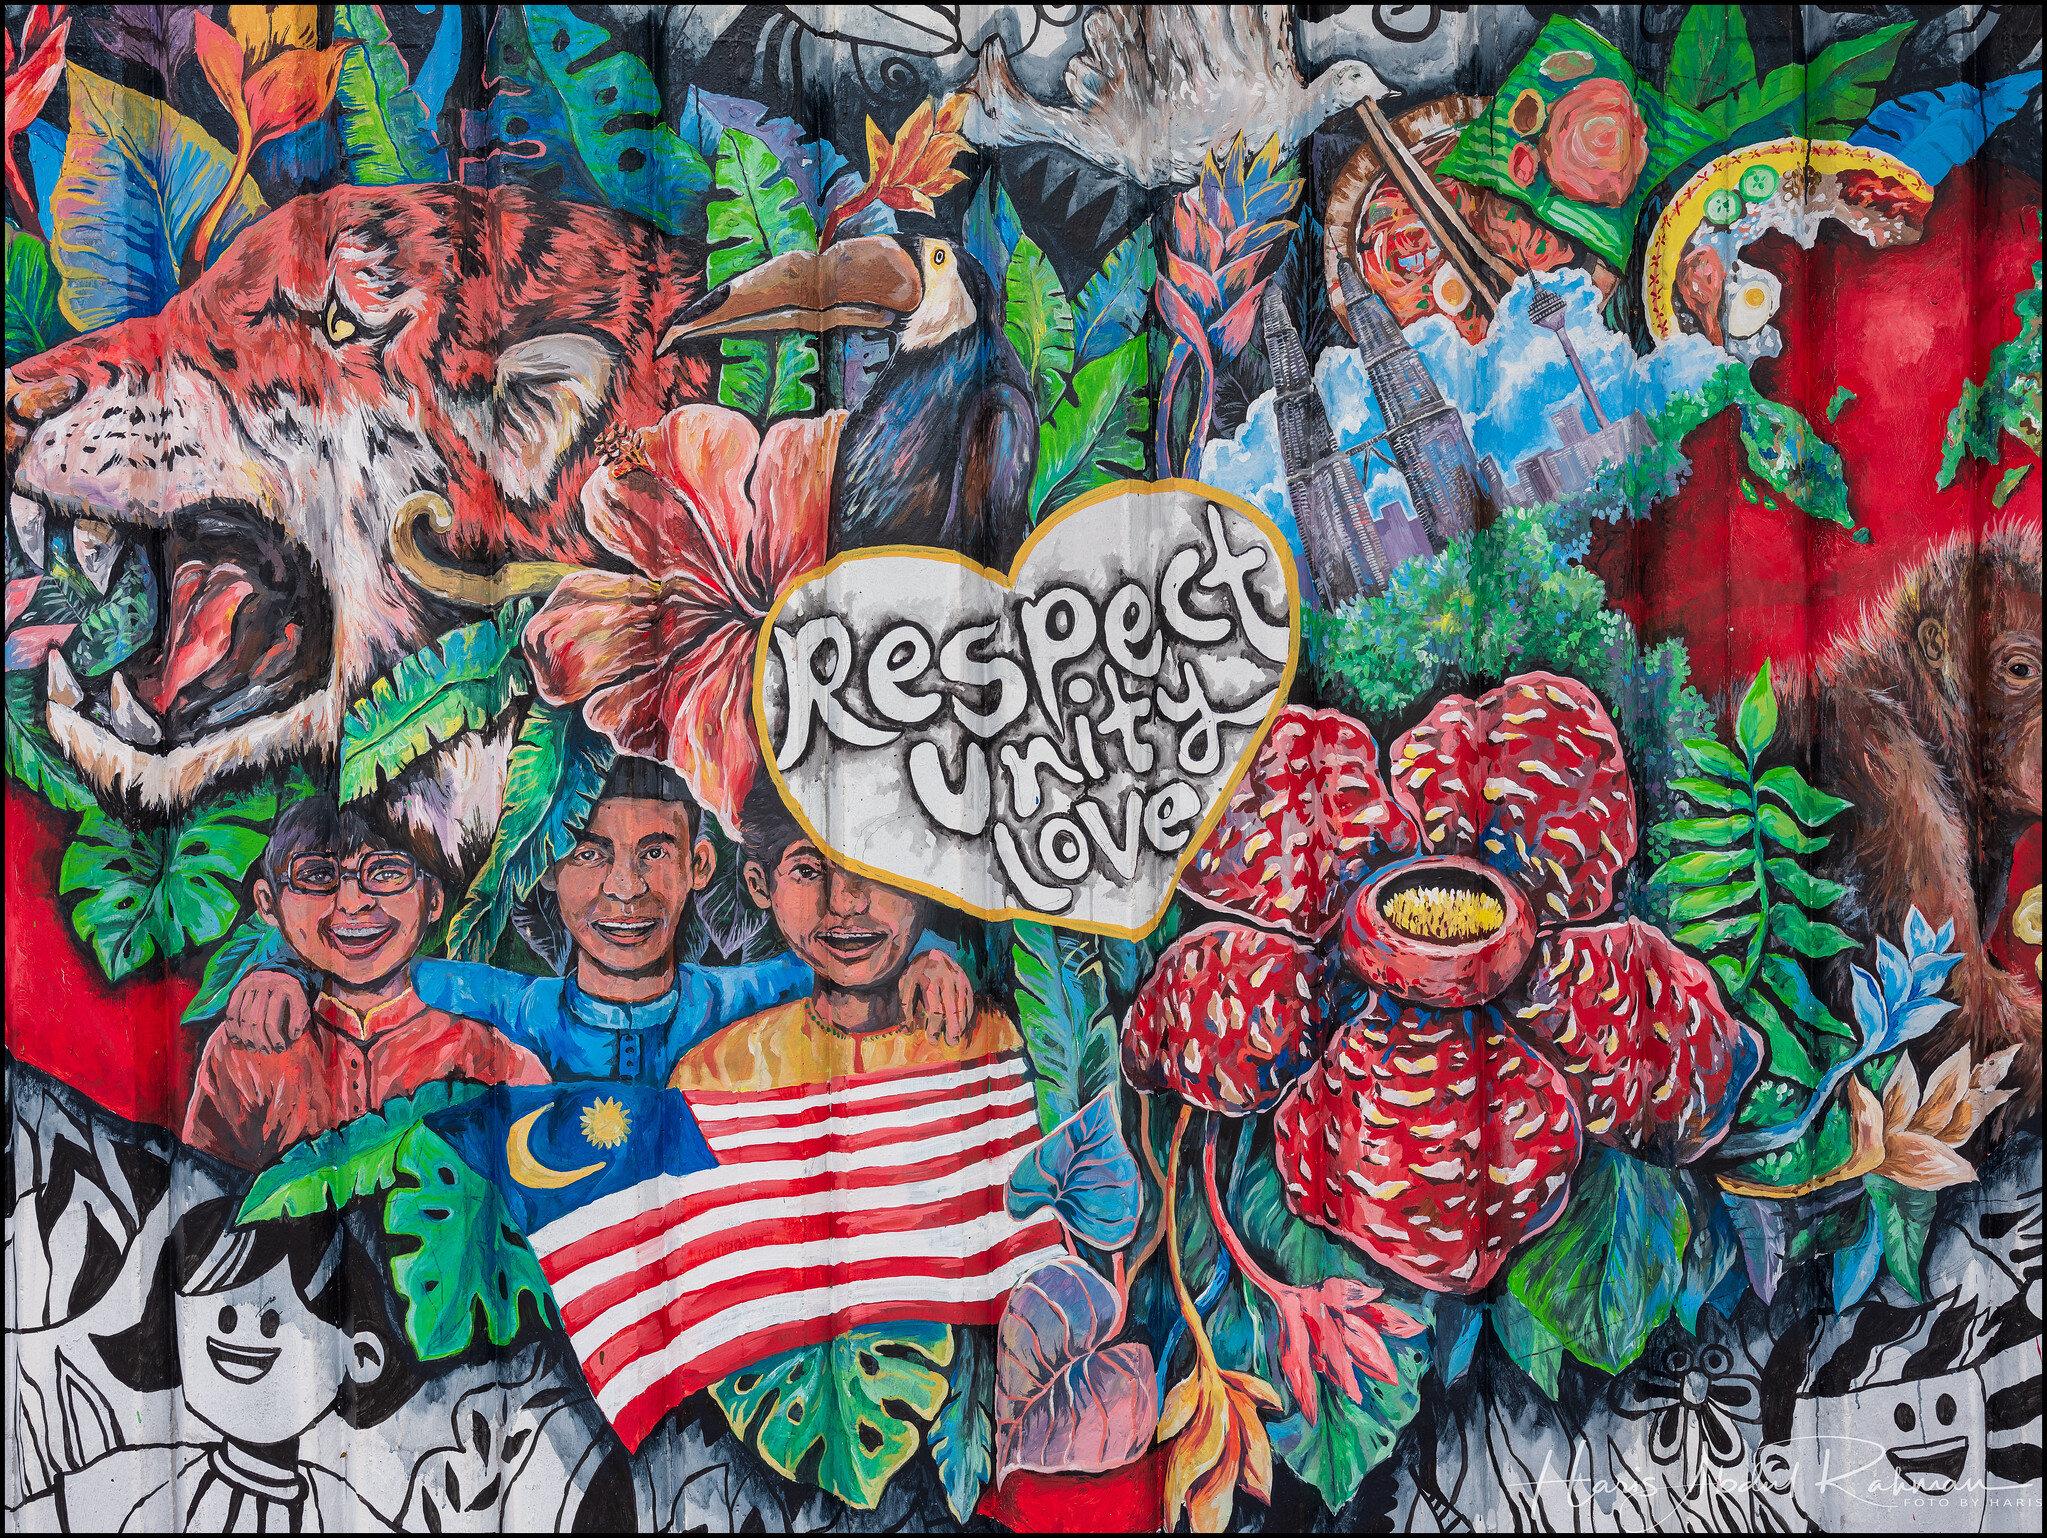 Respect. Unity. Love.